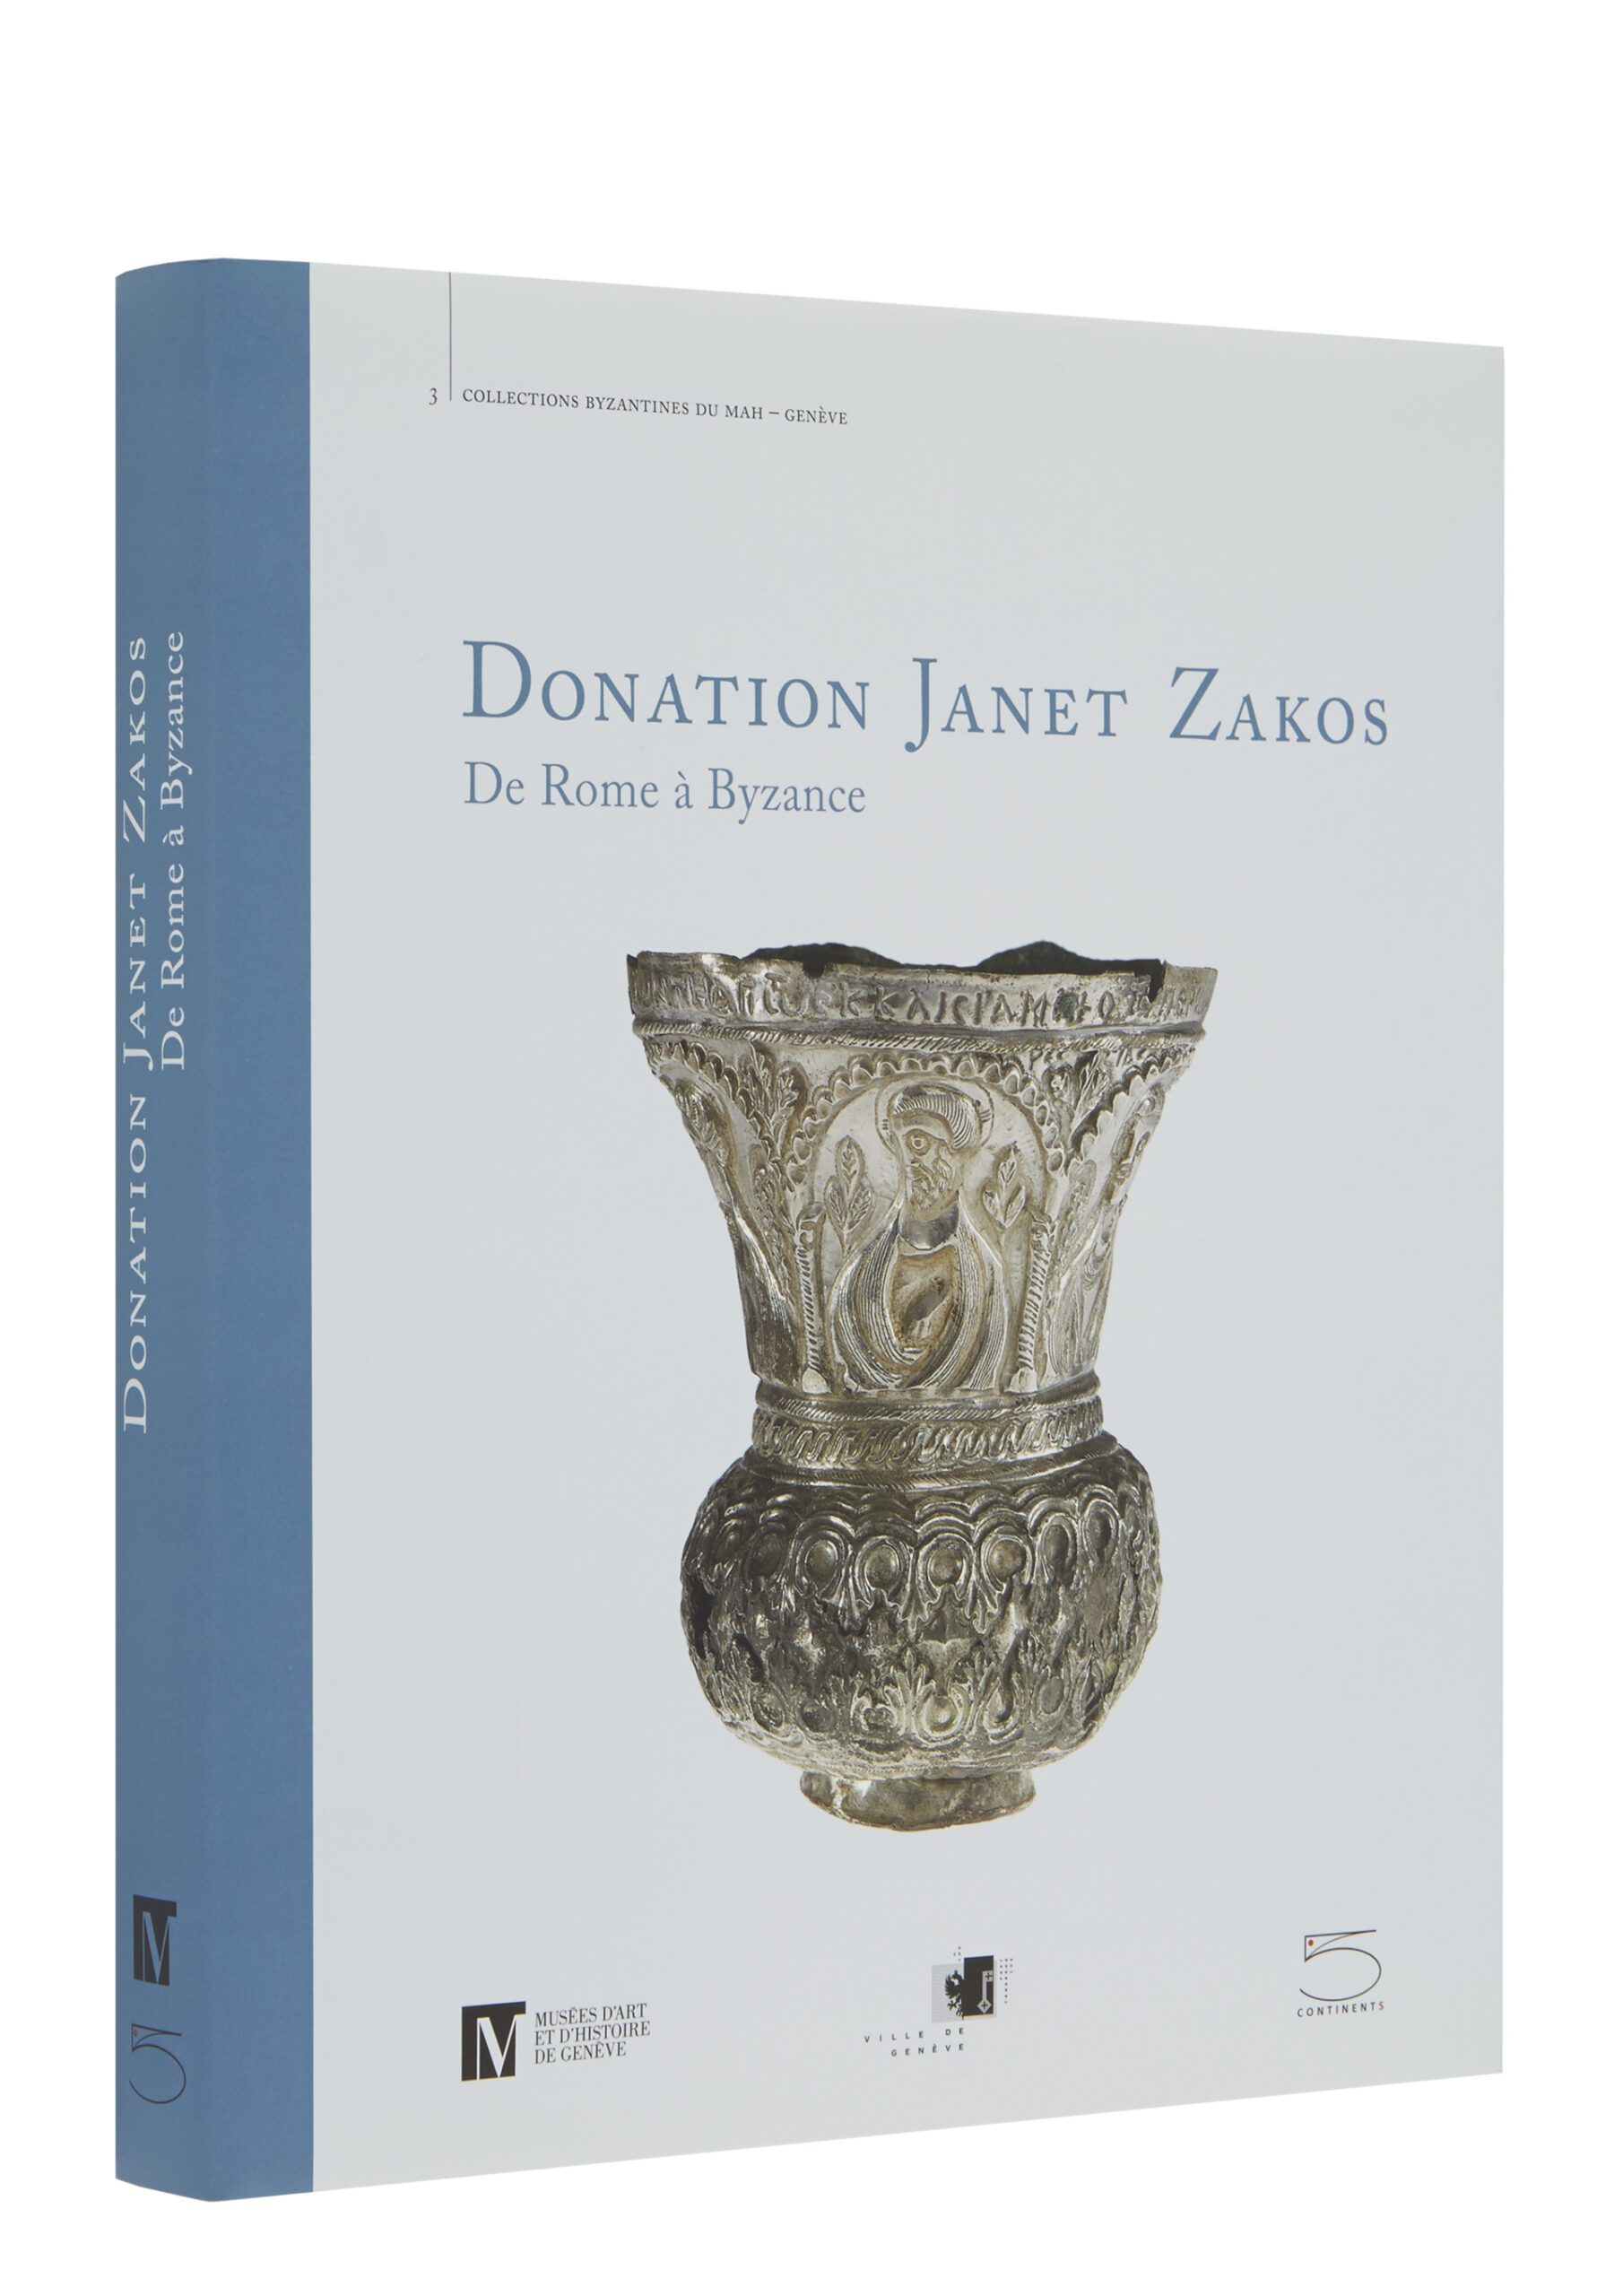 Donation Janet Zakos